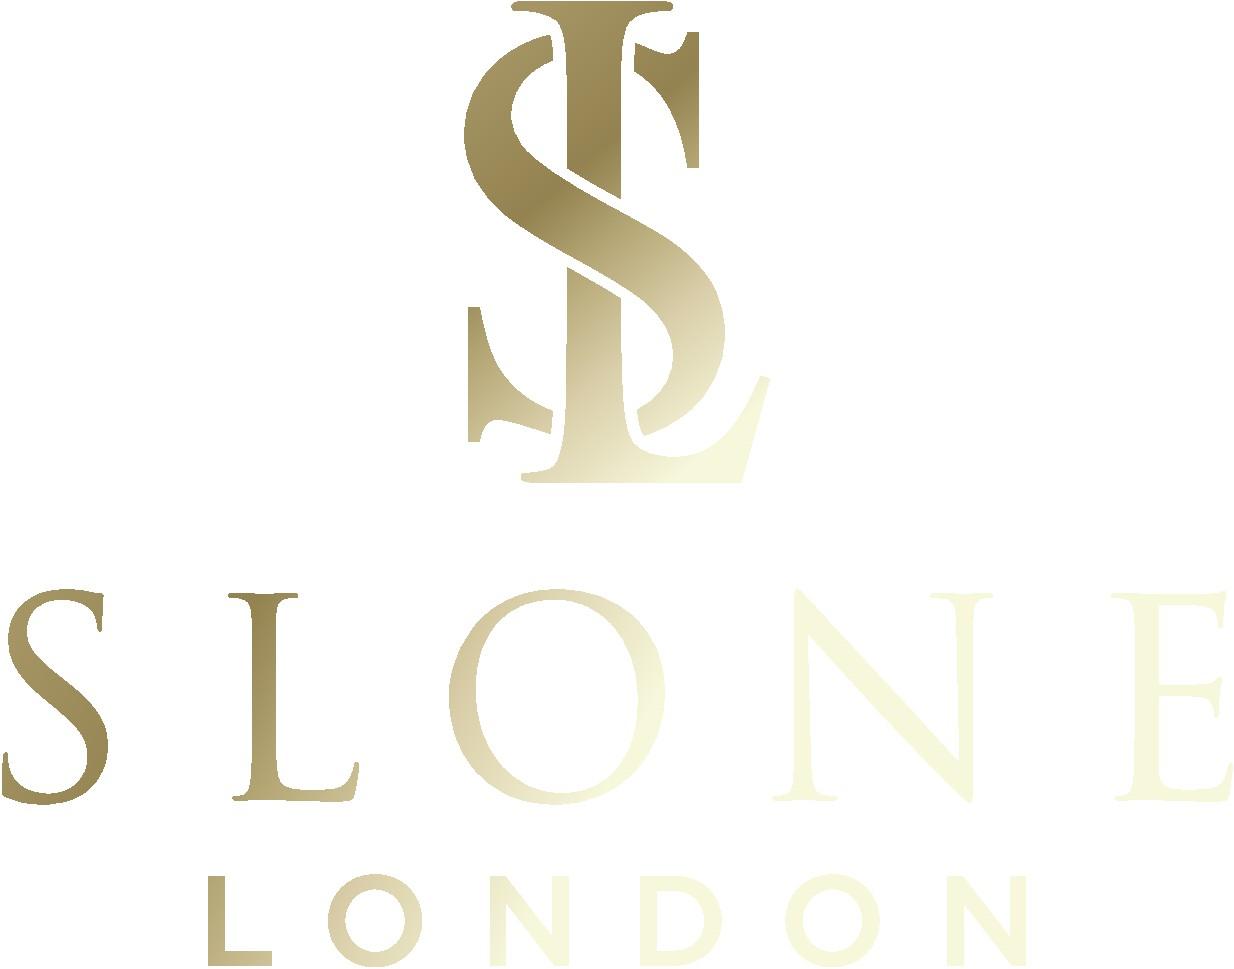 New online jewellery shop needs new logo